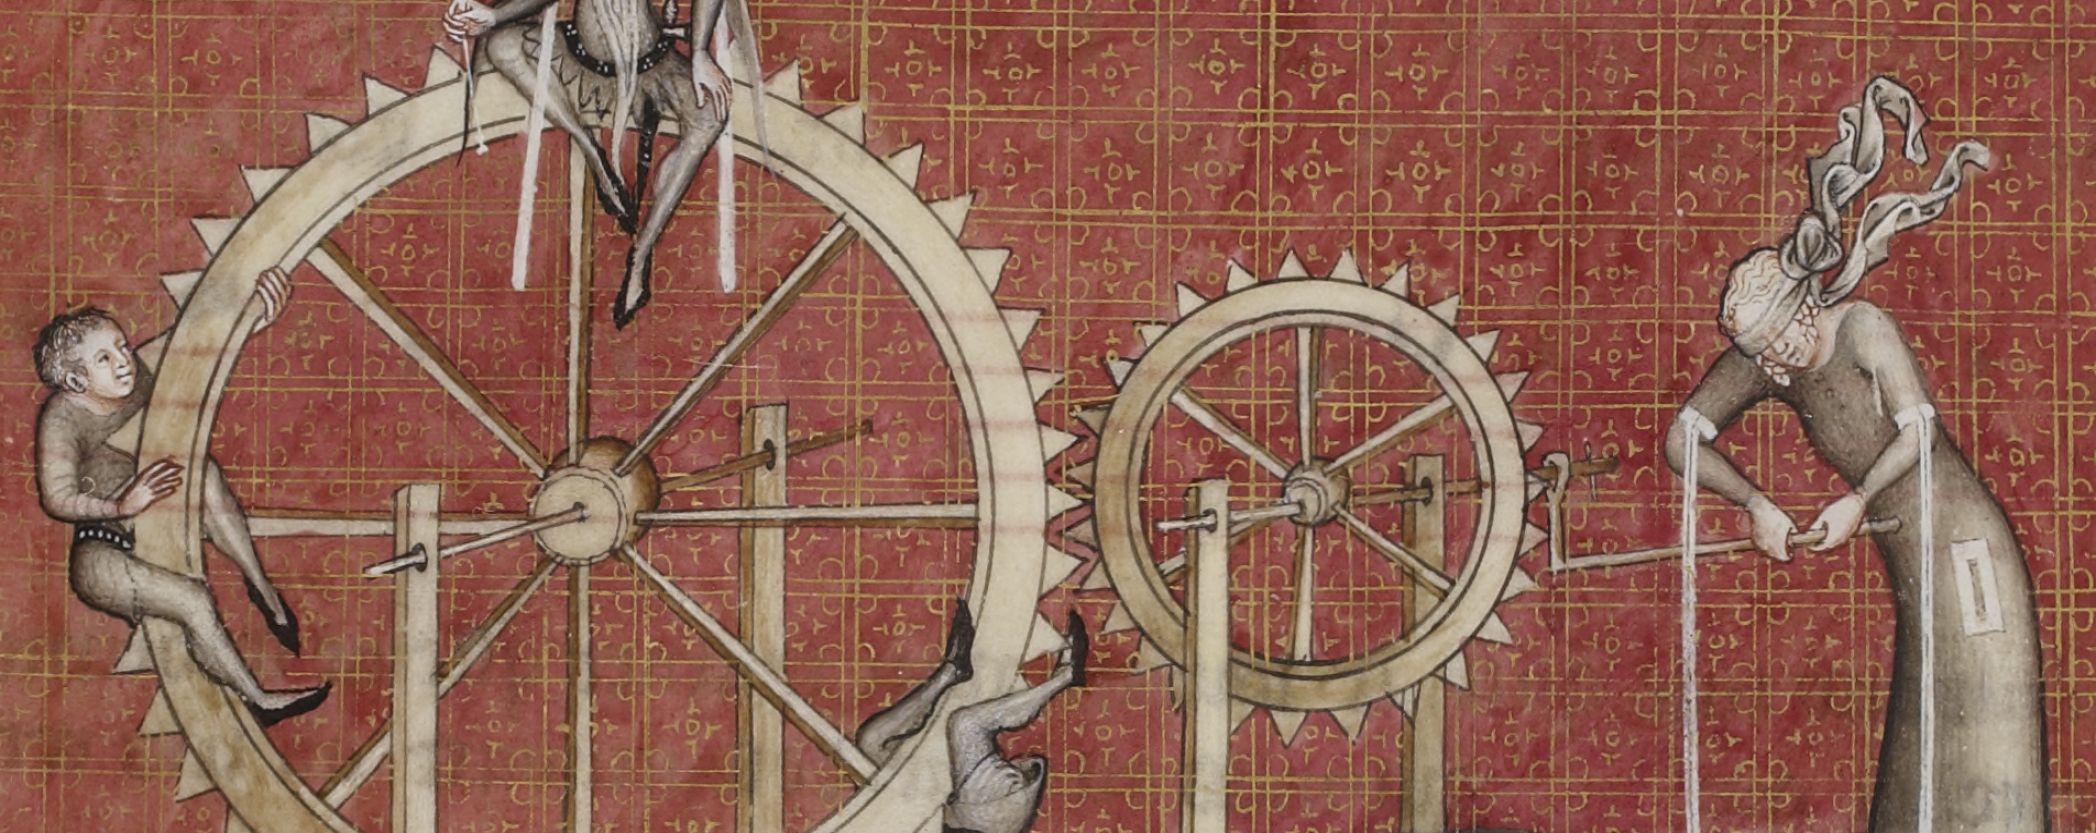 Image result for gear art medieval